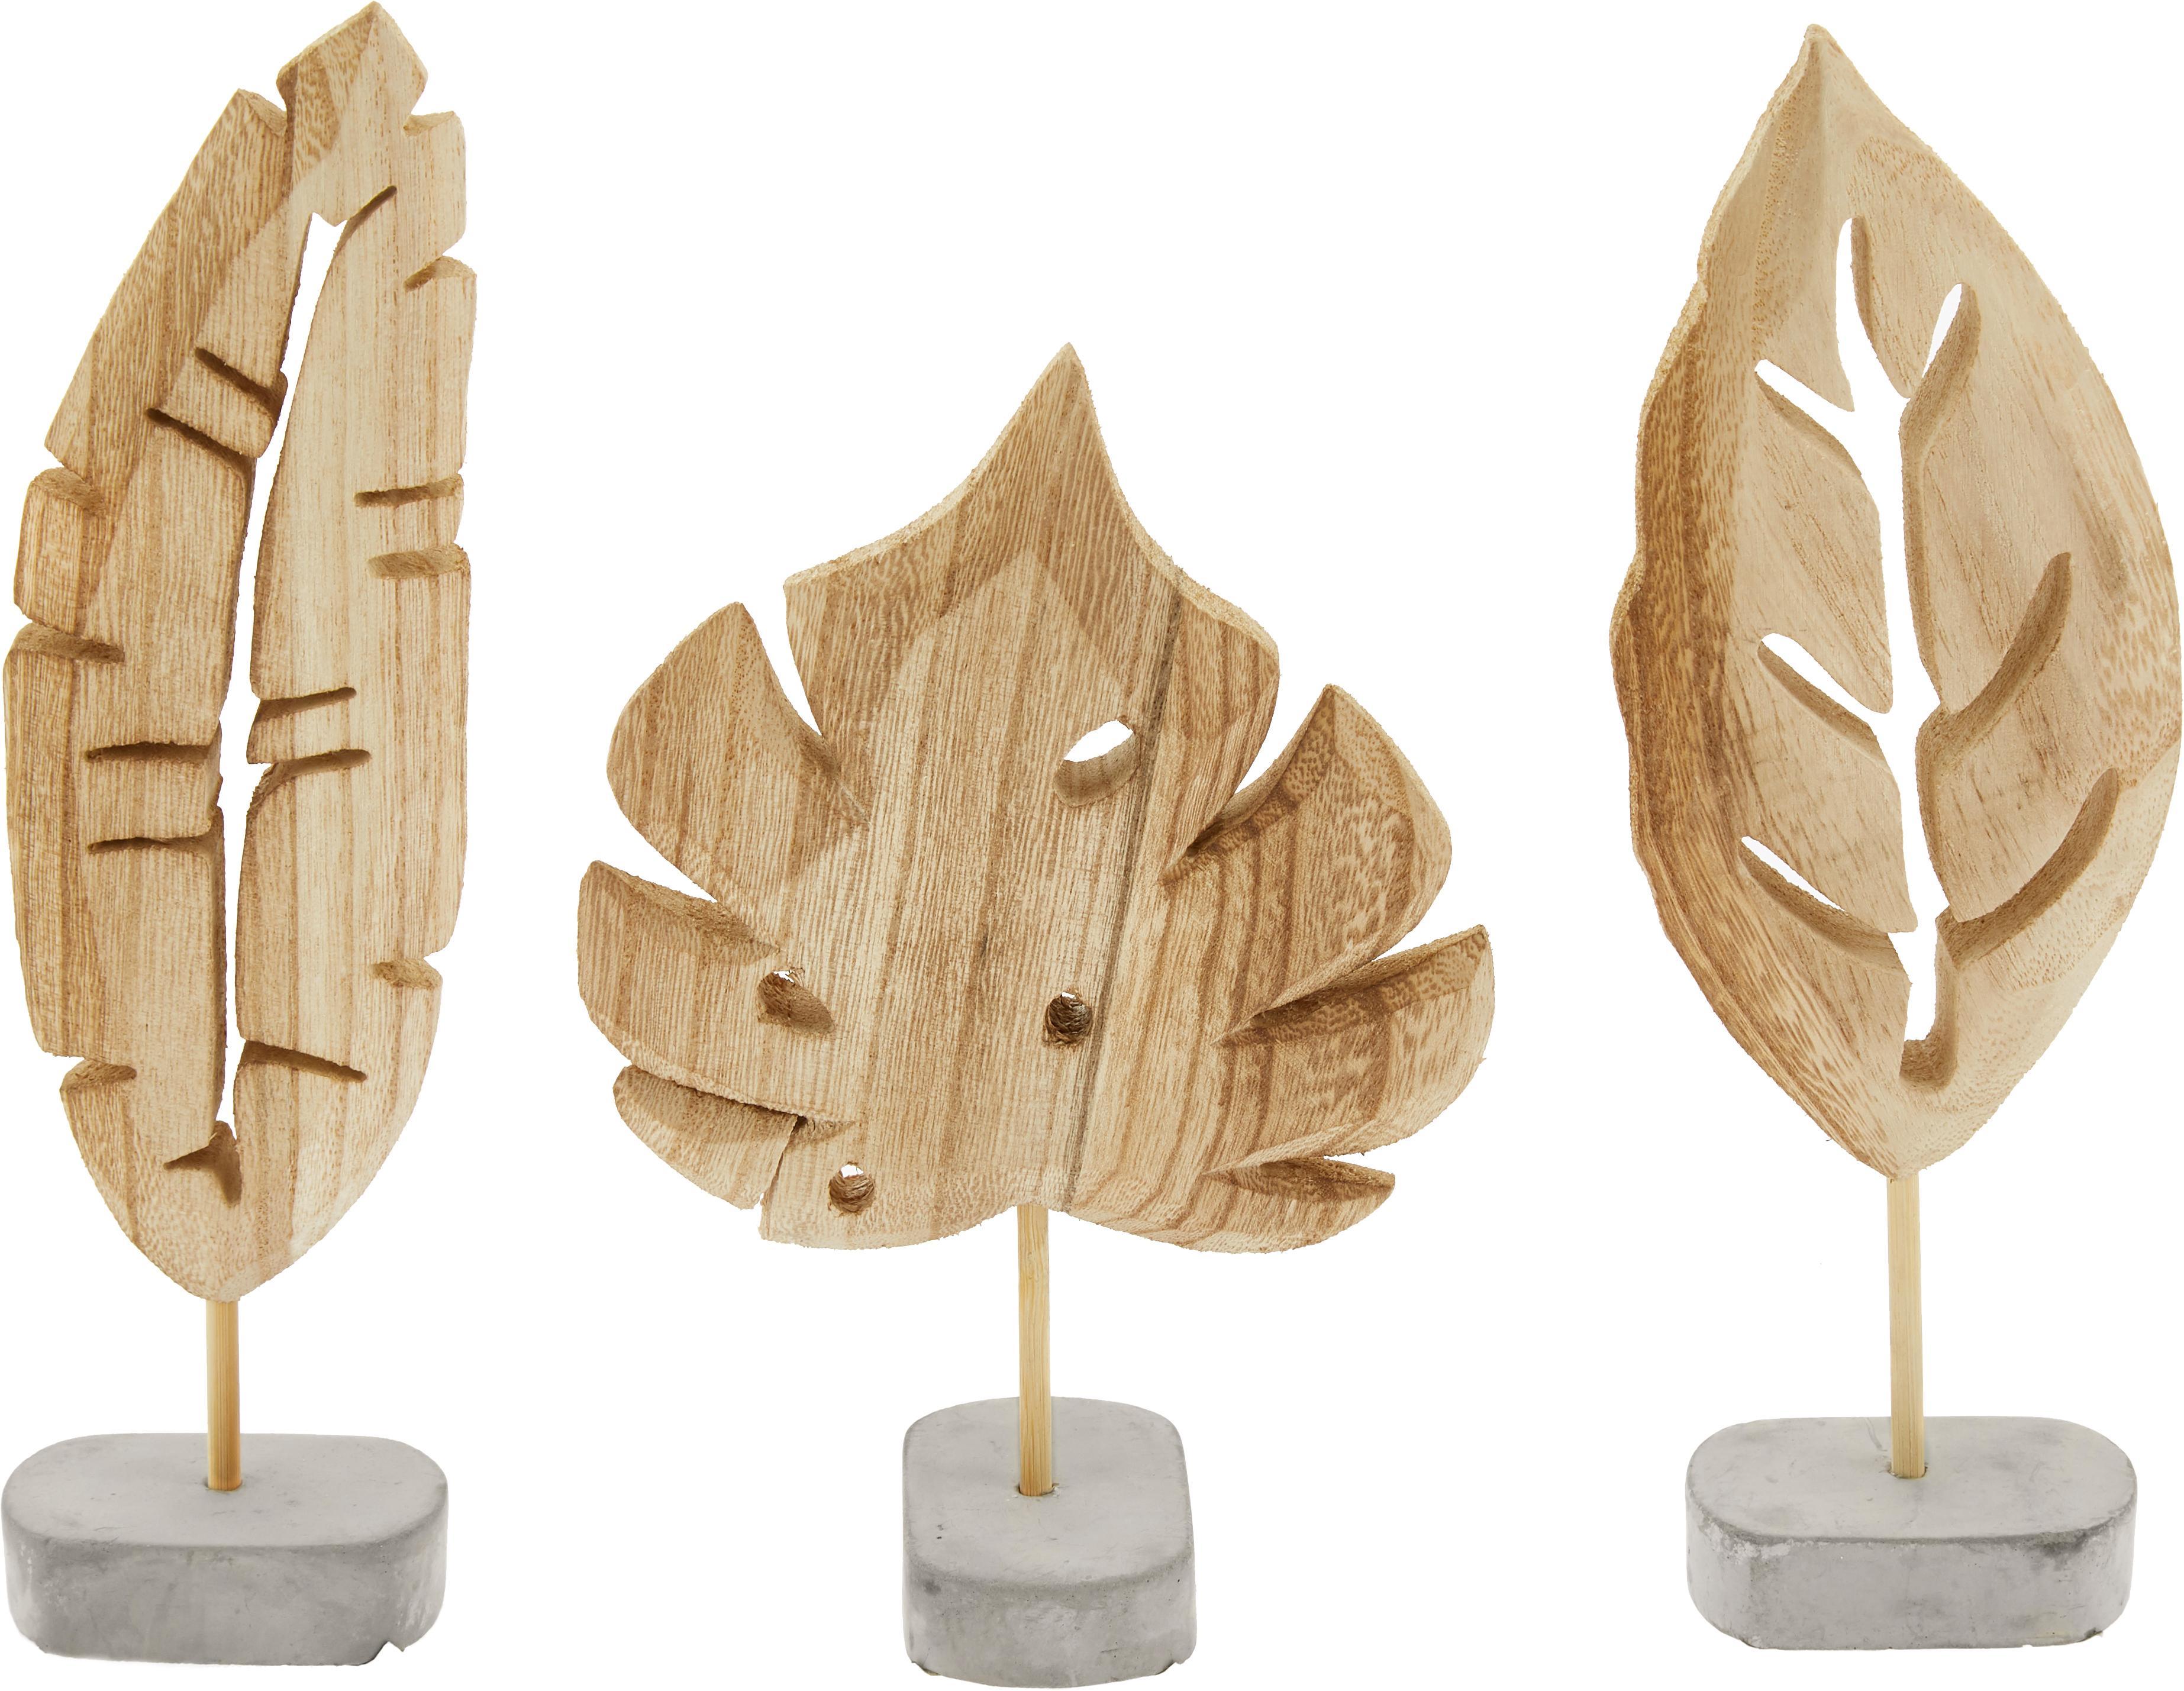 Set oggetti da decorazione Blatt, 3 pz., Presa di corrente: cemento, Presa di corrente: grigio oggetto da decorazione: legno di Paulownia, Diverse dimensioni